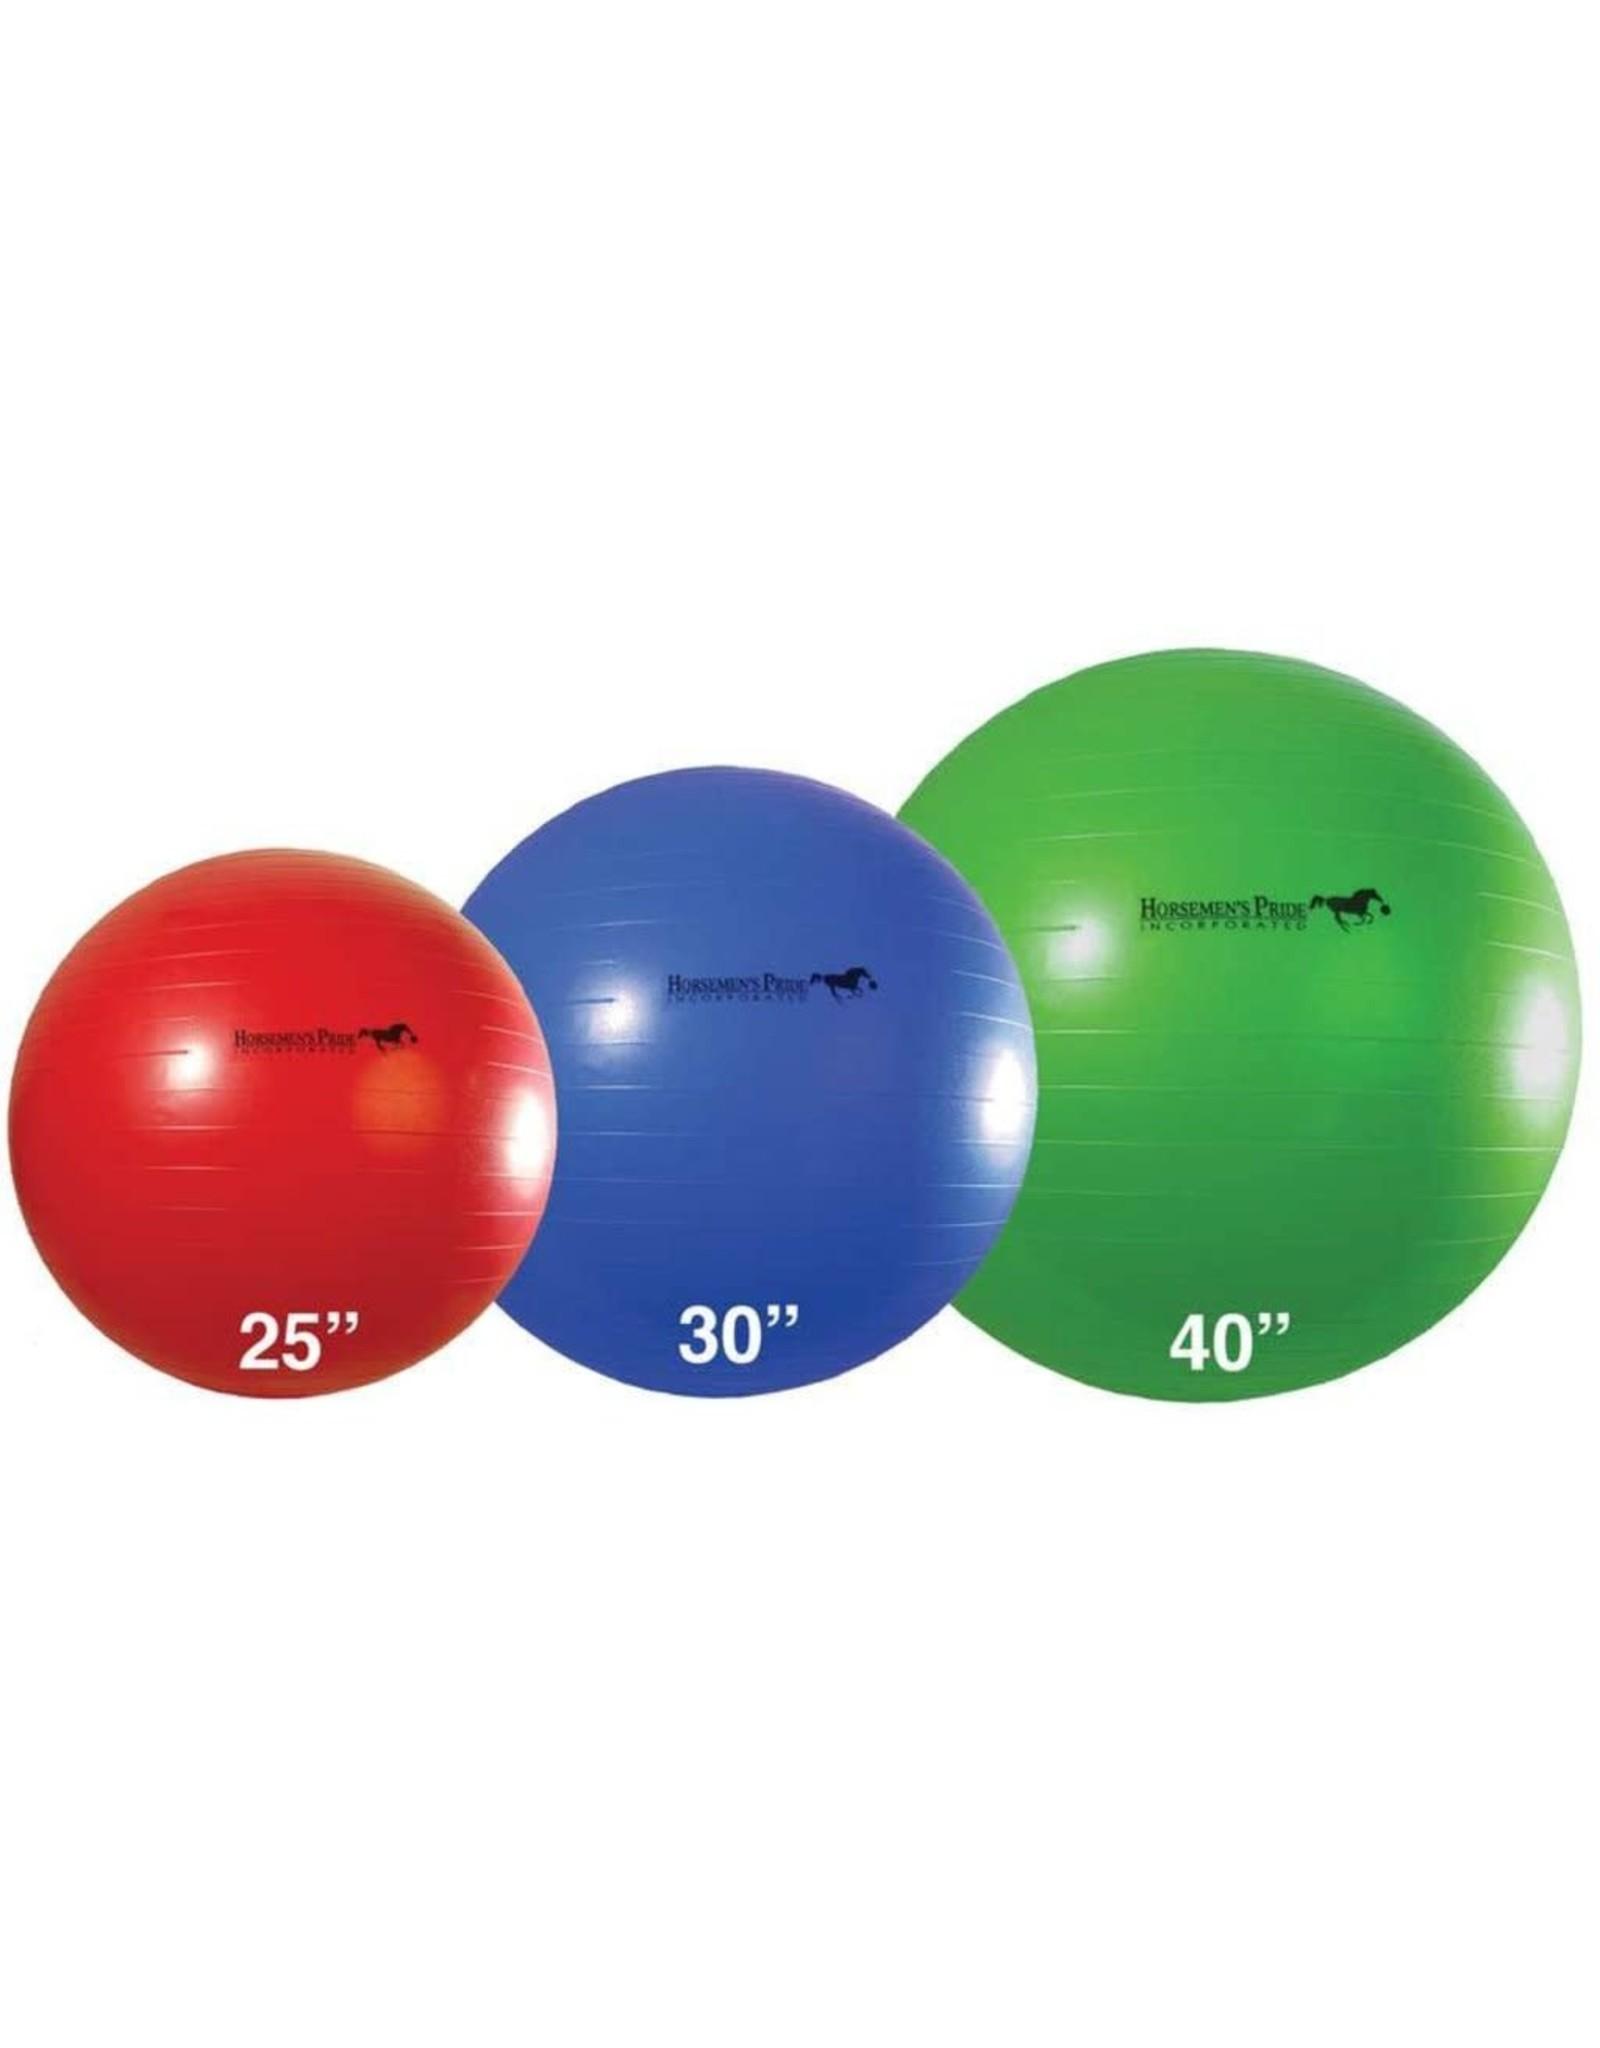 Horsemen's Pride Jolly Mega Ball